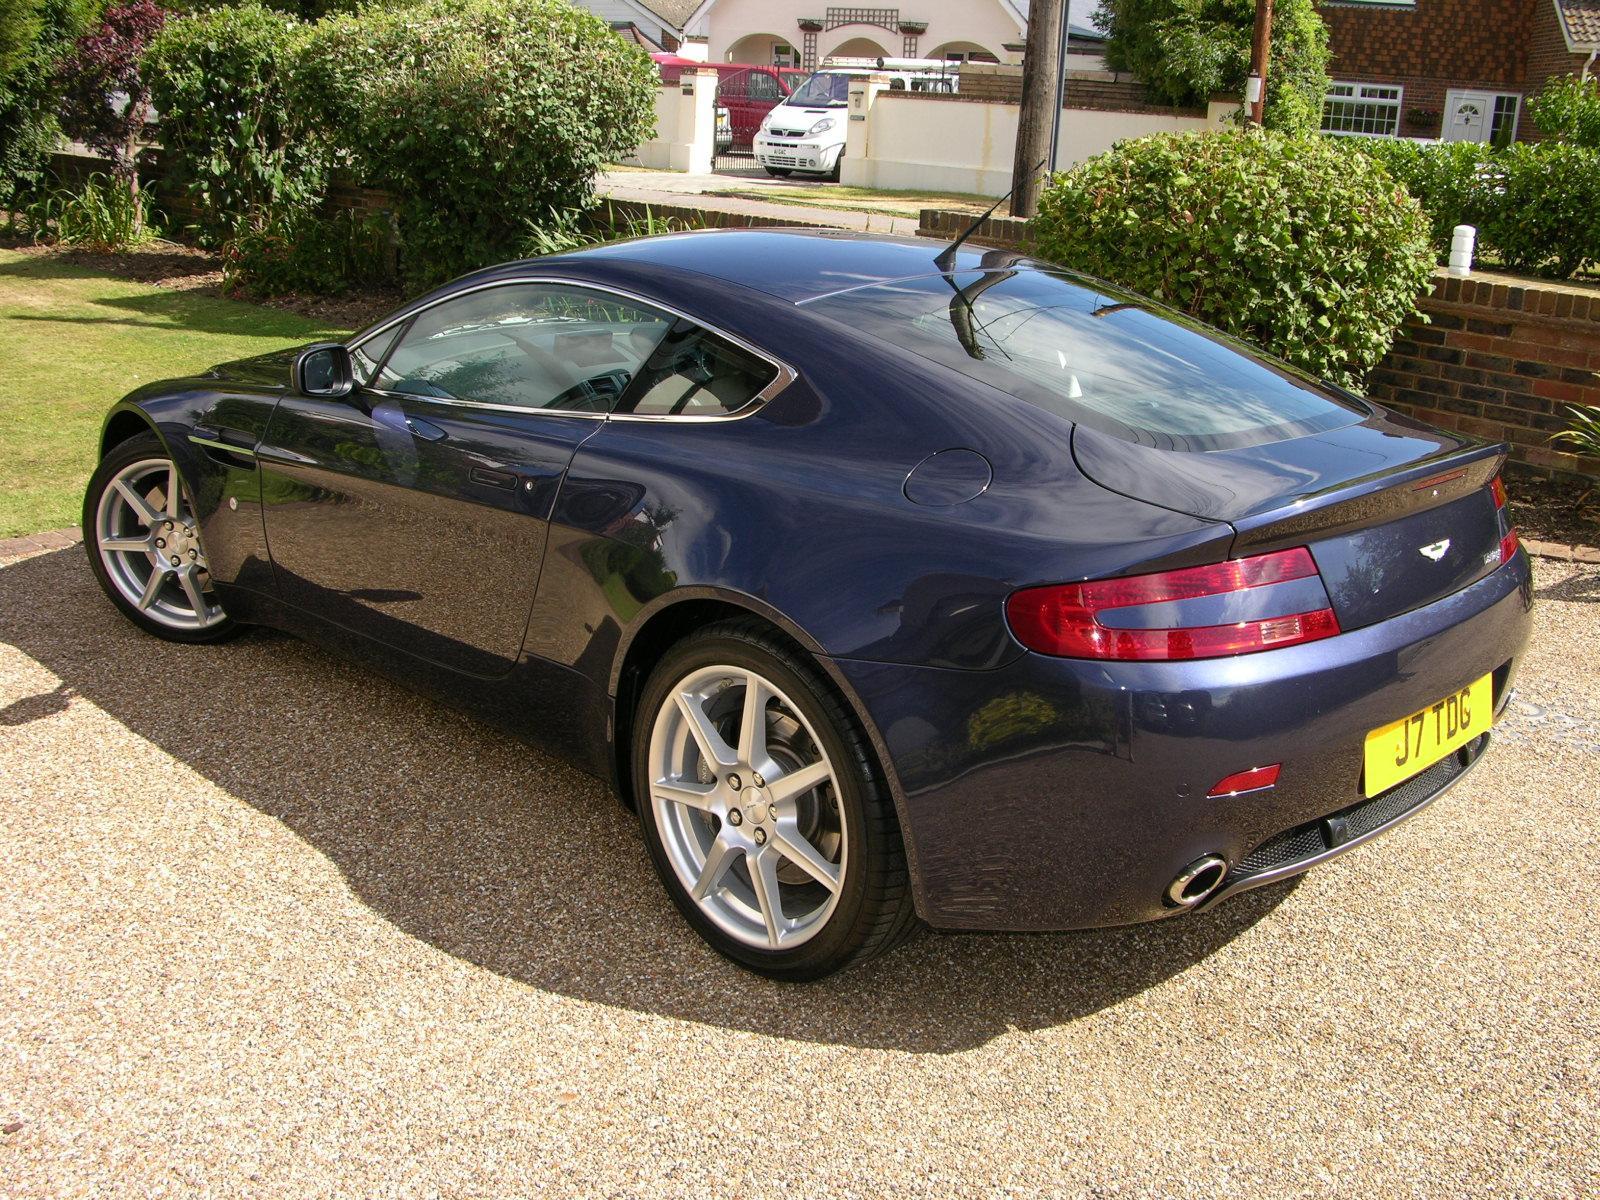 Superb File:2006 Aston Martin V8 Vantage   Flickr   The Car Spy (22)